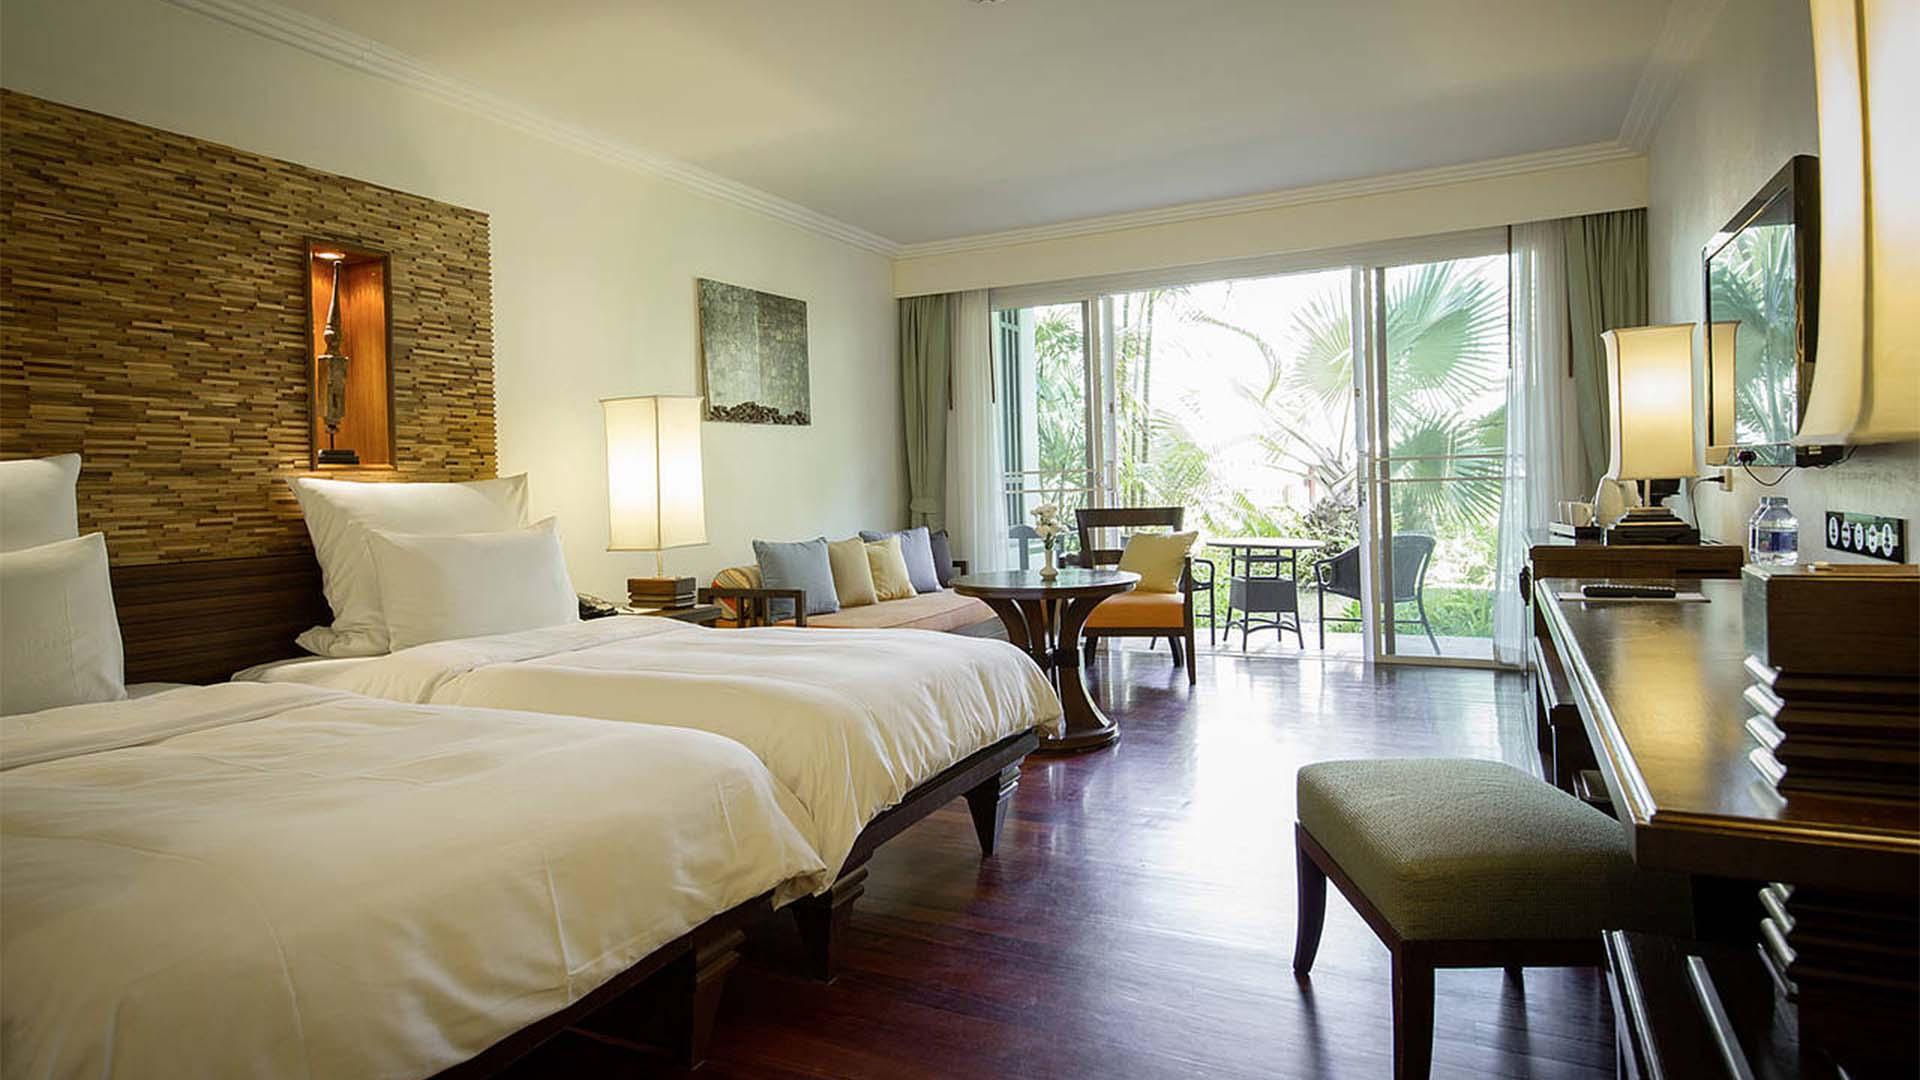 Family Room image 1 at Robinson Club Khao Lak by Amphoe Takua Pa, Chang Wat Phang-nga, Thailand